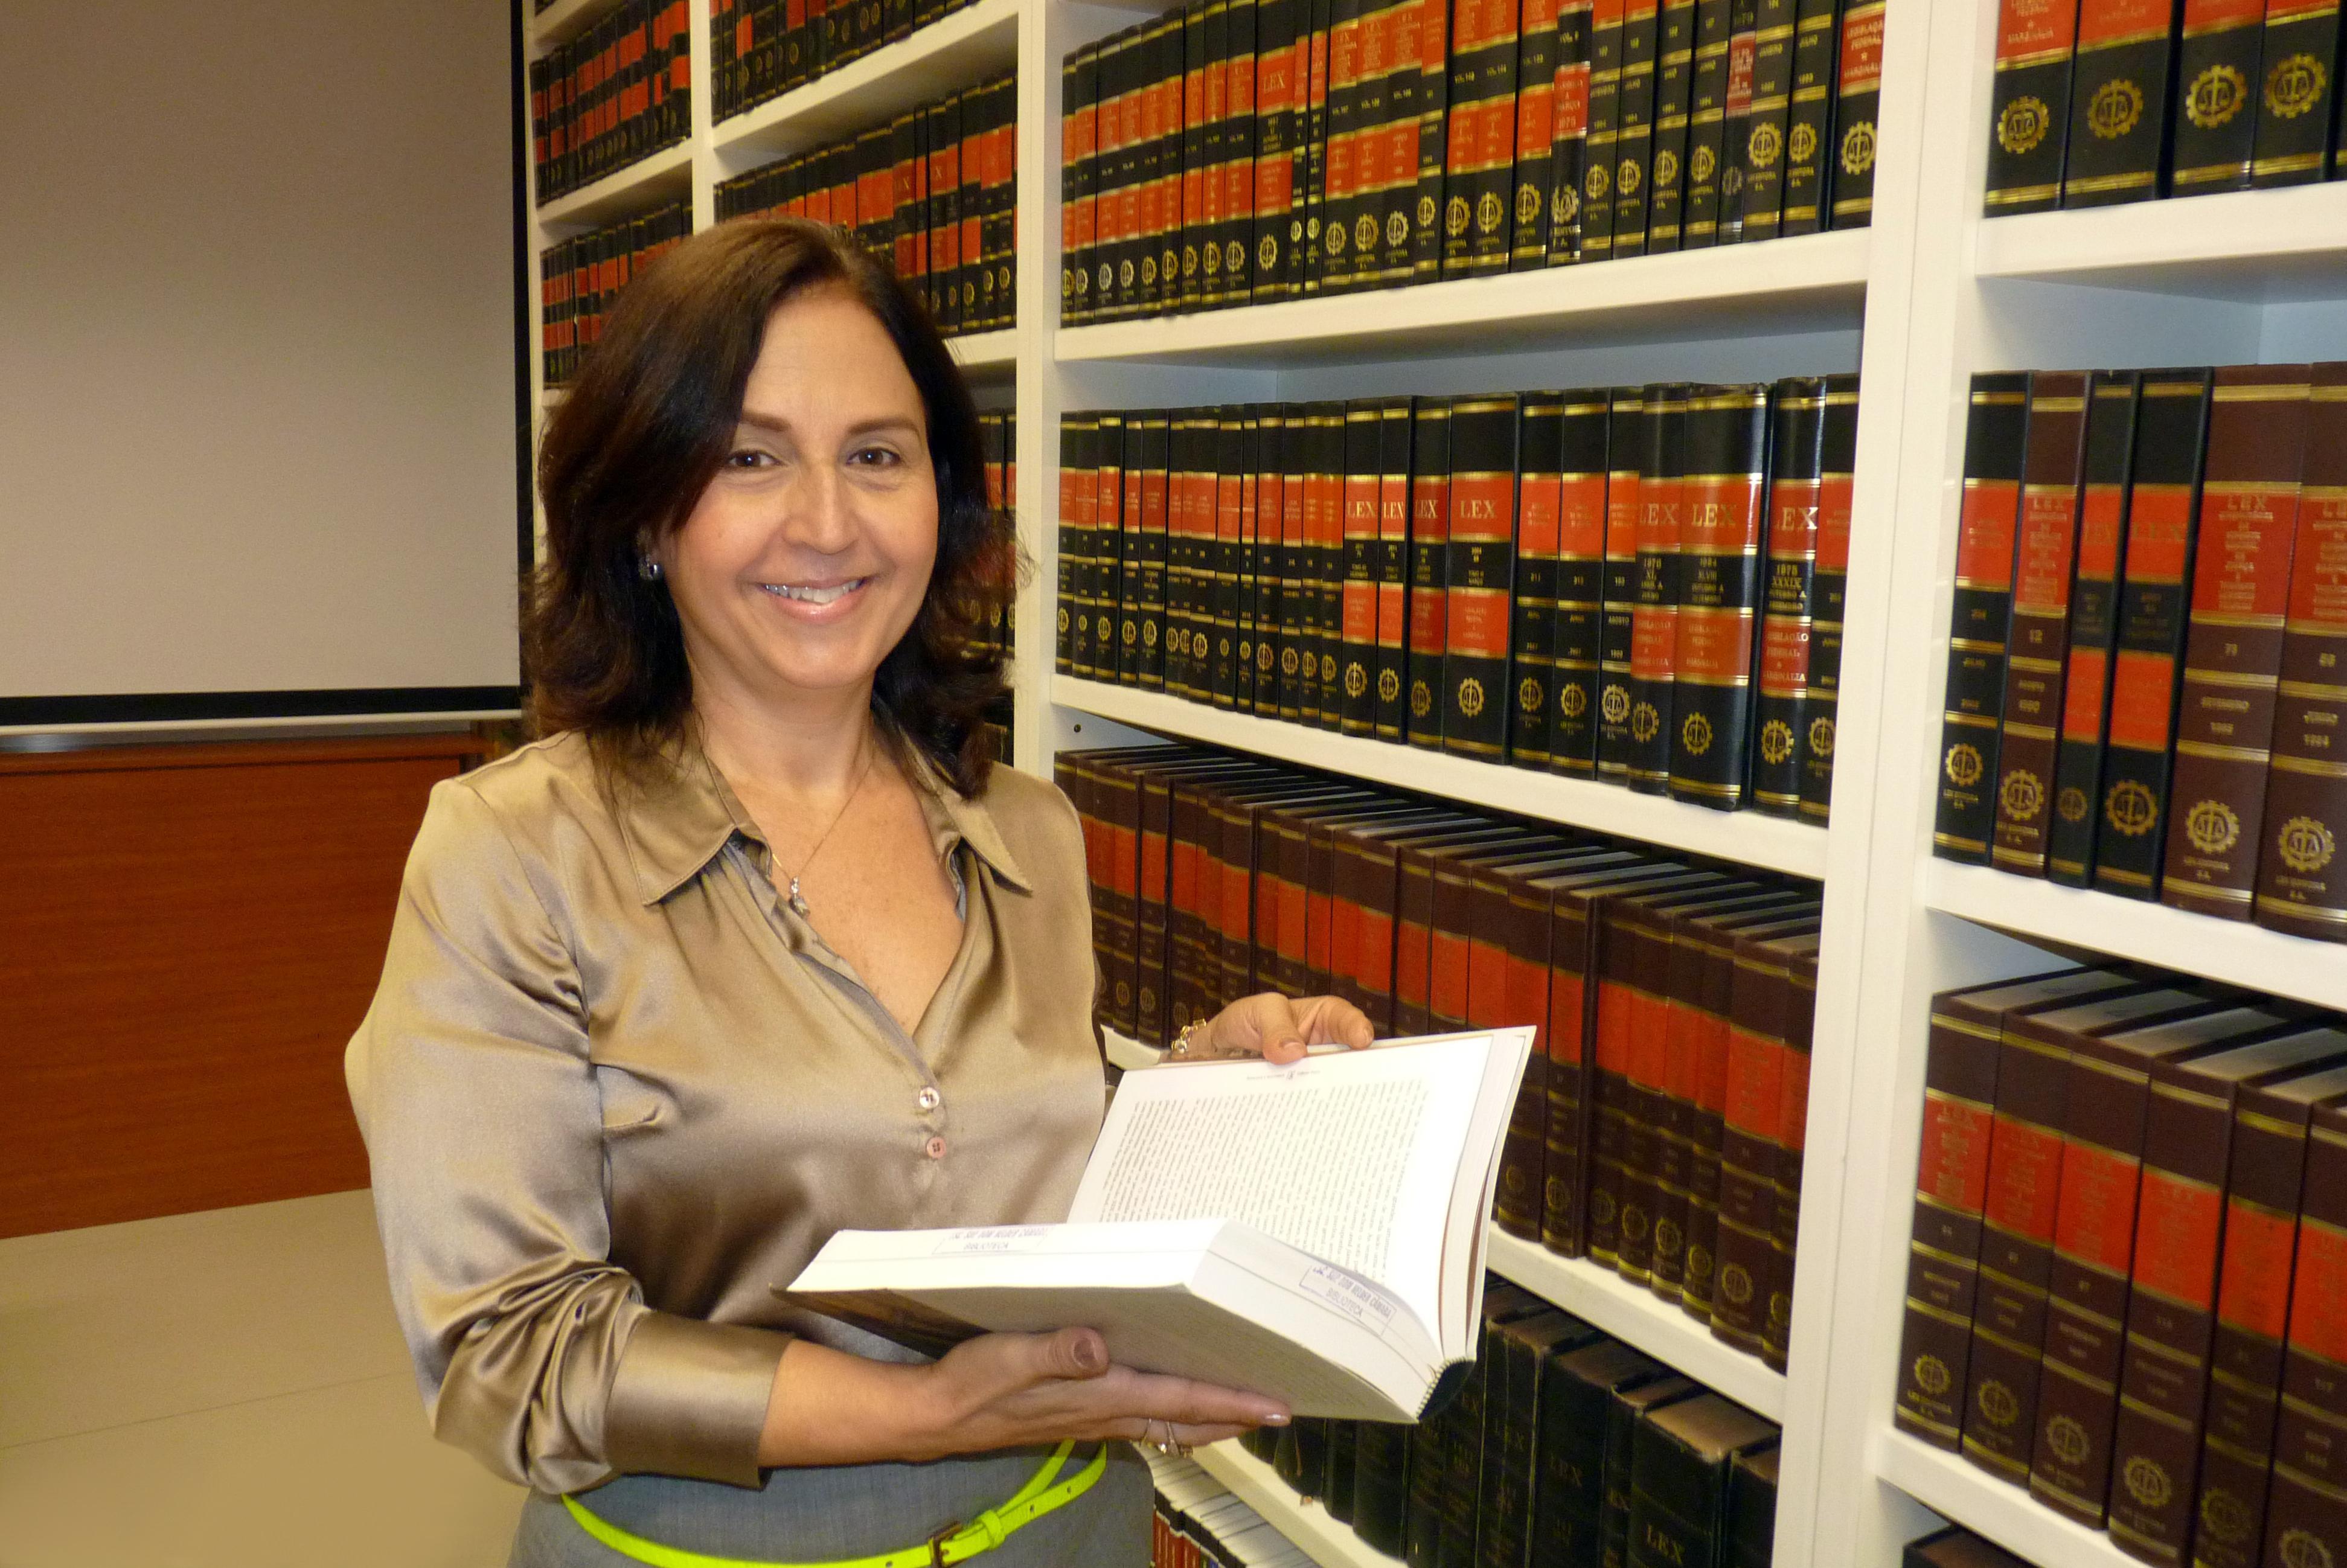 Professora Beatriz Souza Costa, Pró-Reitora de Pesquisa da Dom Helder